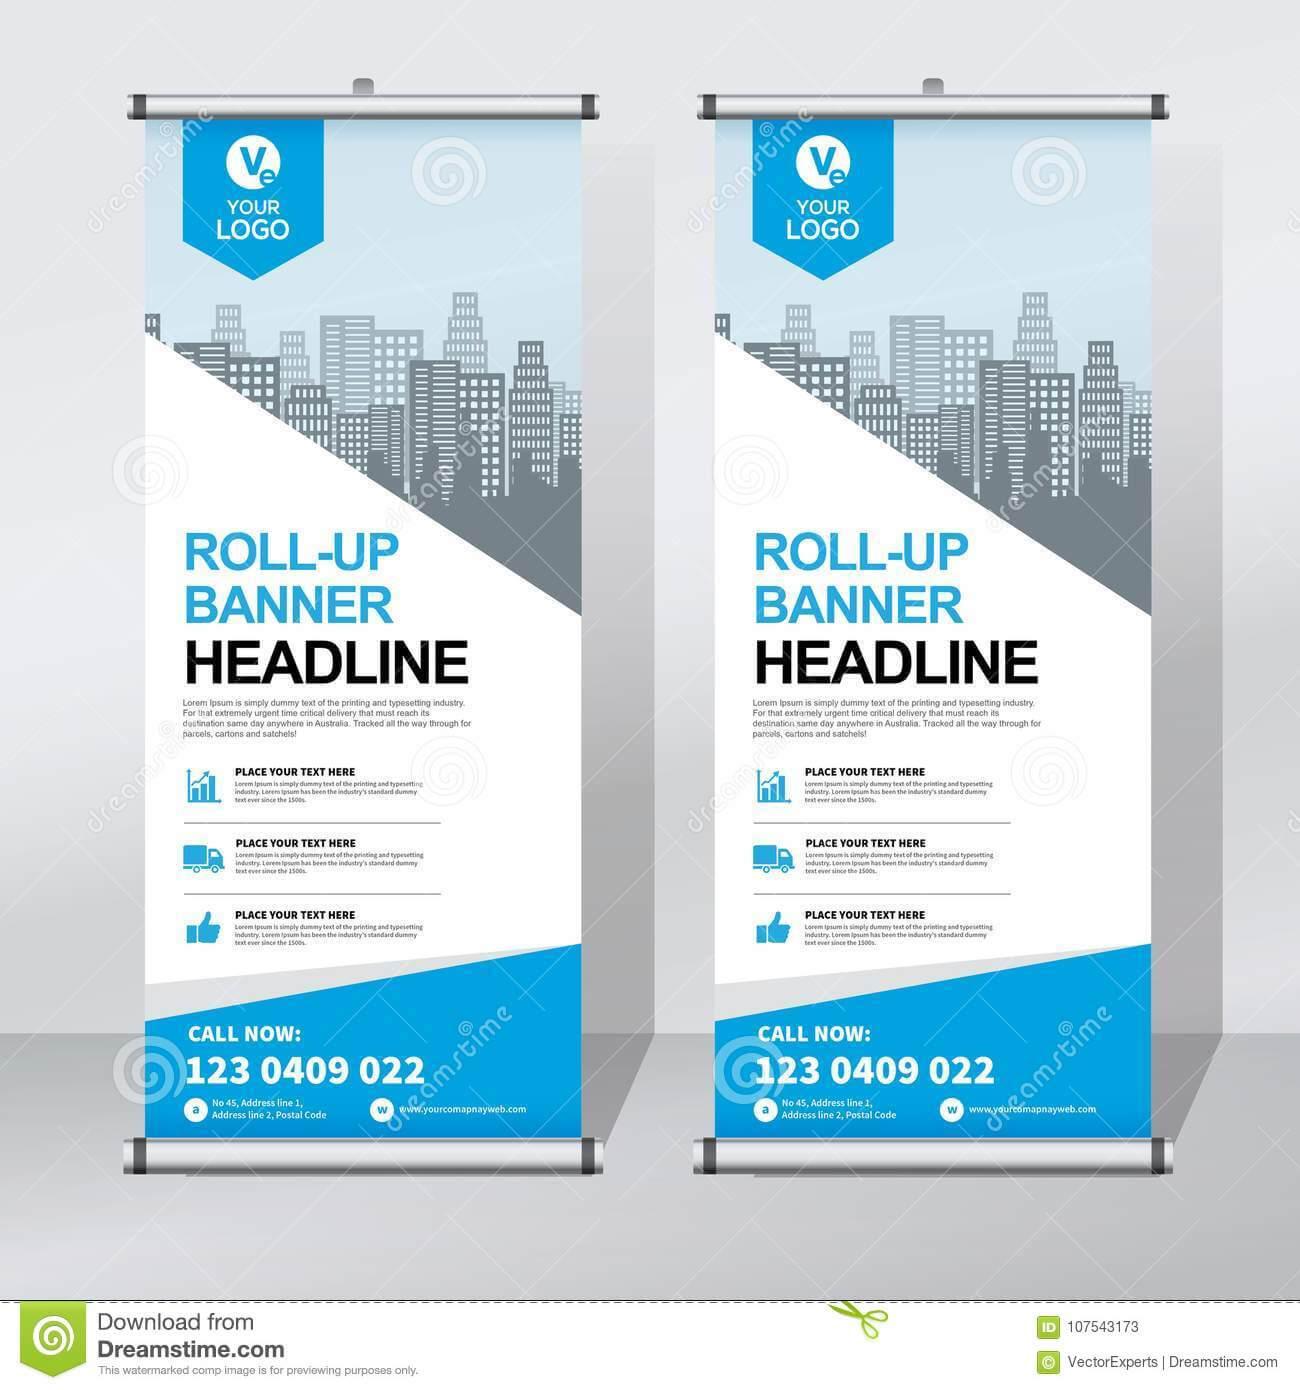 Roll Up Banner Design Template, Vertical, Abstract Throughout Pop Up Banner Design Template